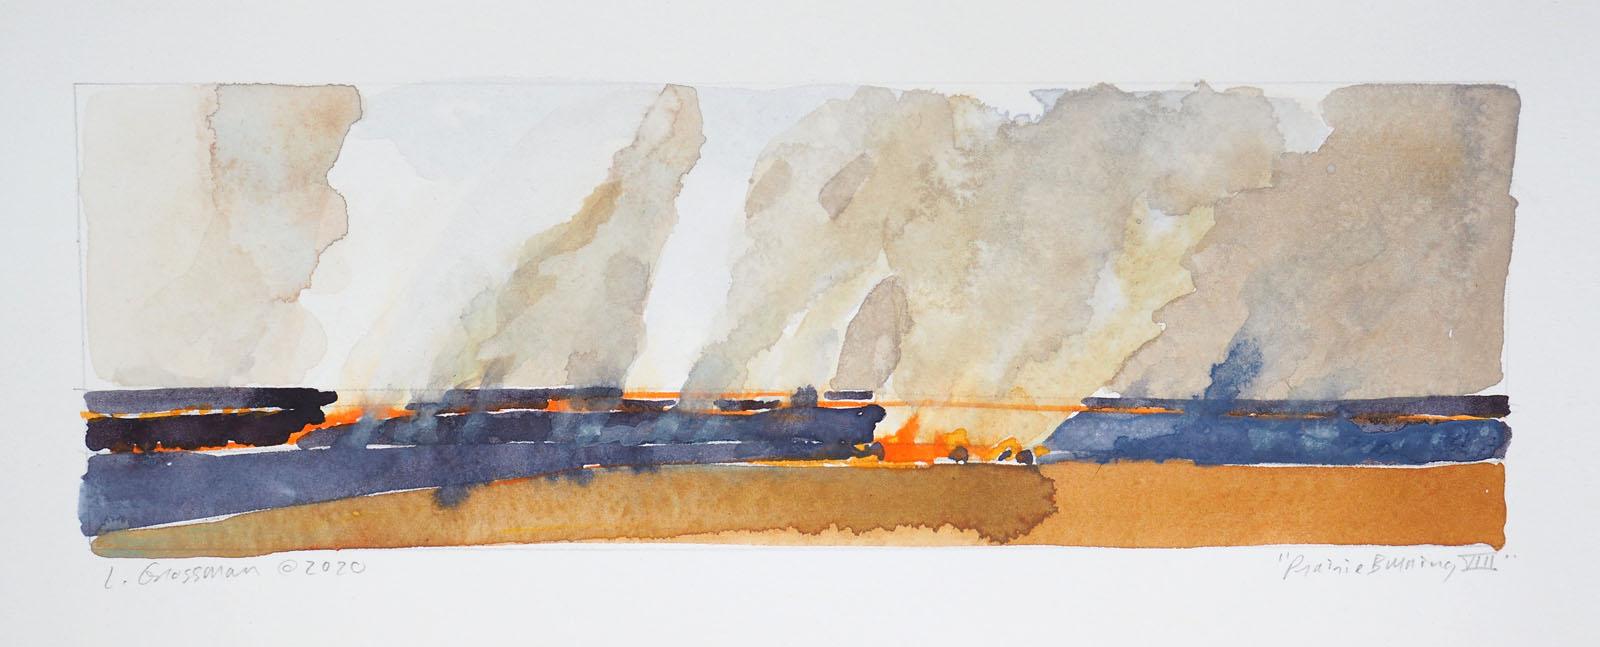 Prairie Burning VIII by  Lisa Grossman - Masterpiece Online